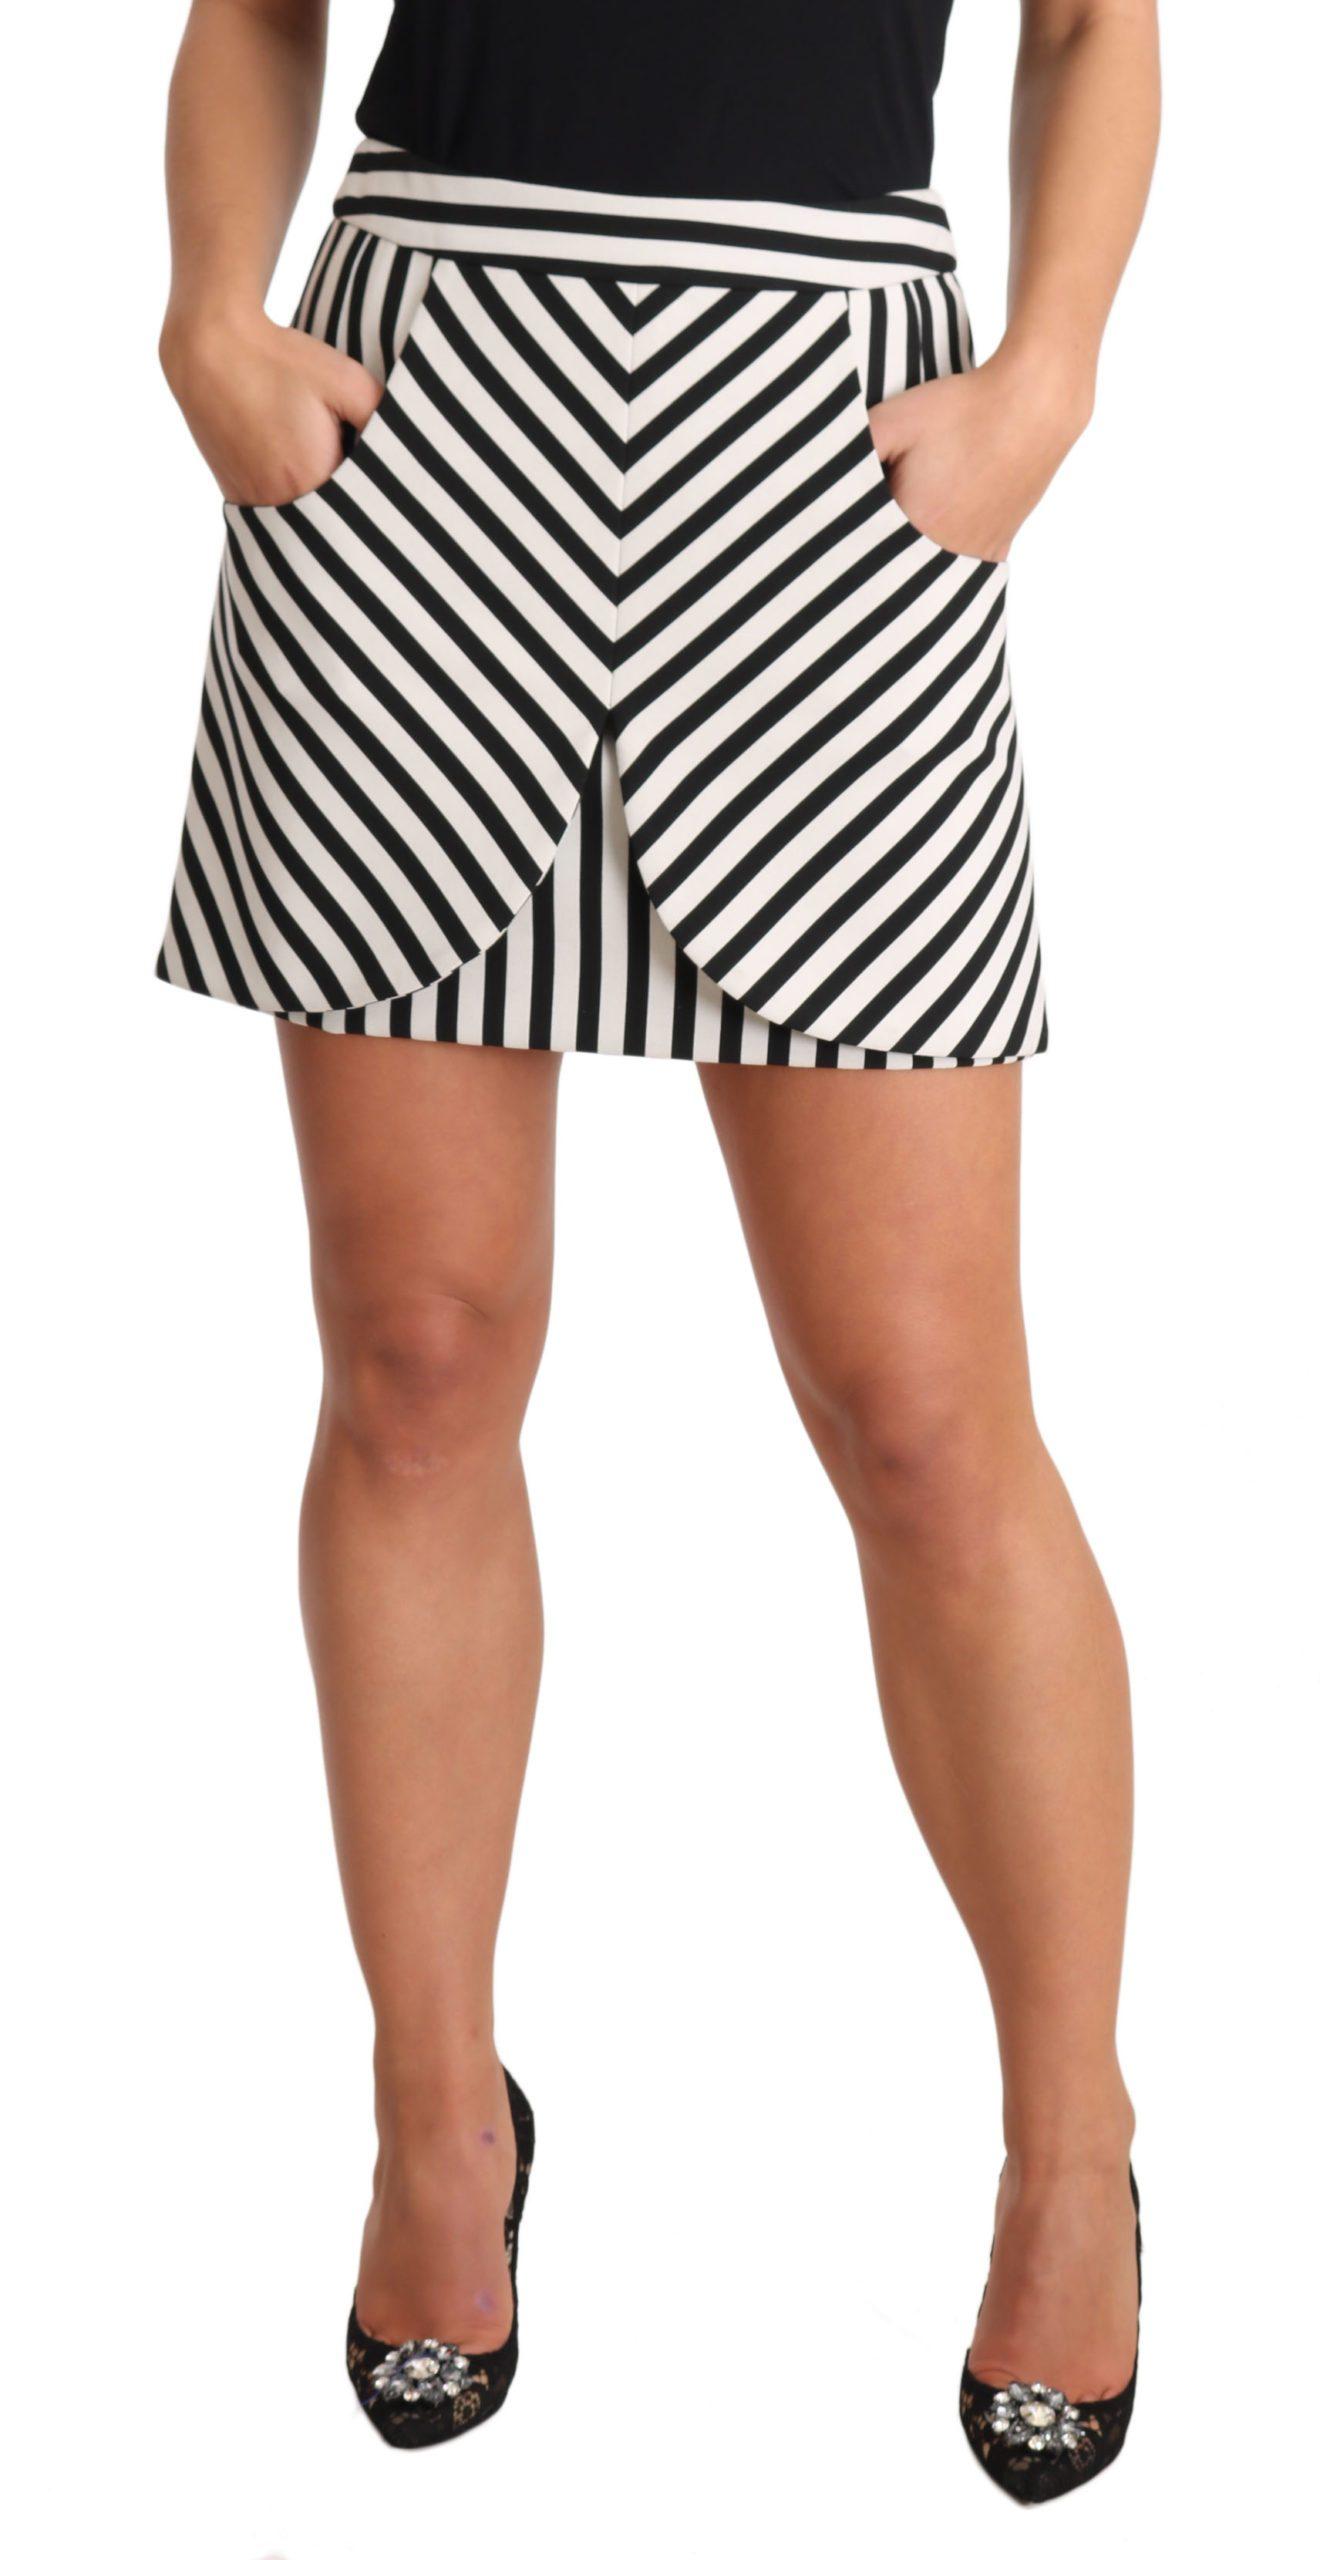 Dolce & Gabbana Women's Skirt Black SKI1310 - IT40|S